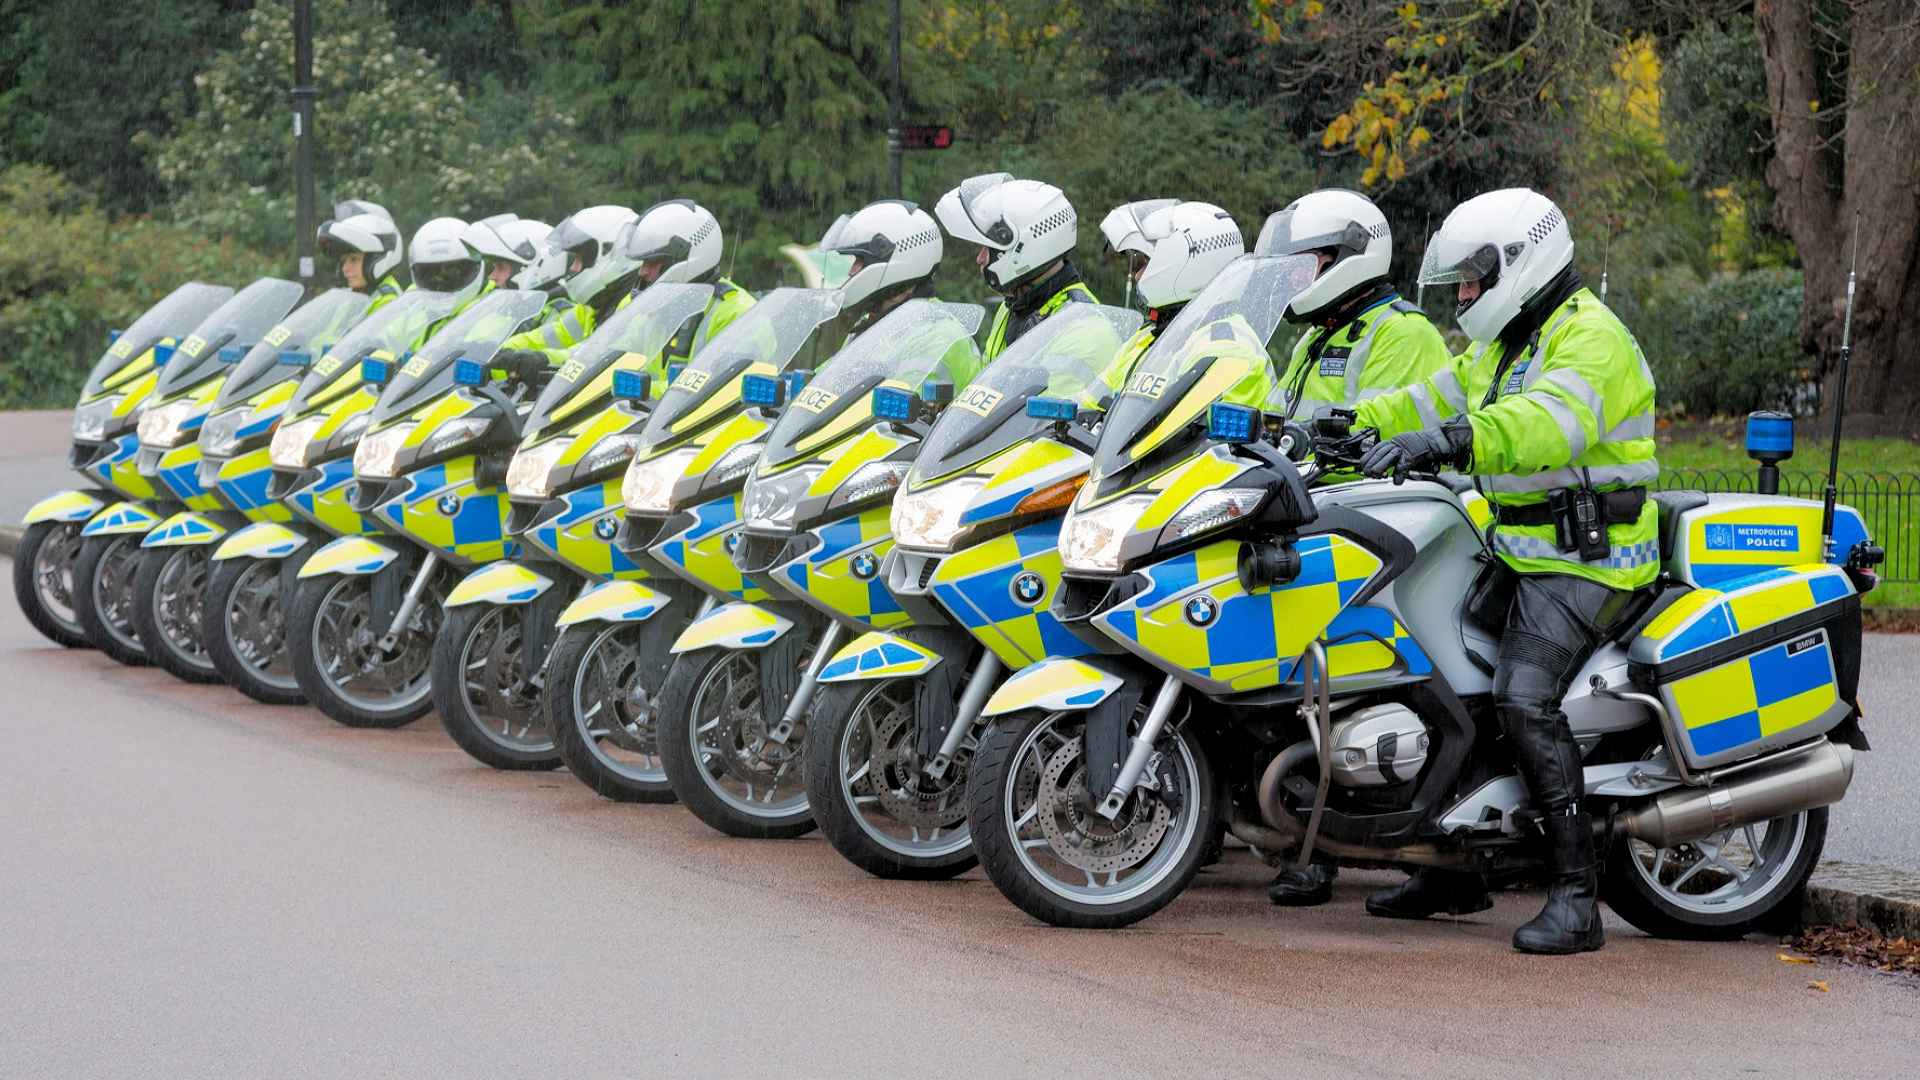 Metropolitan Police BikeSafe Course in London